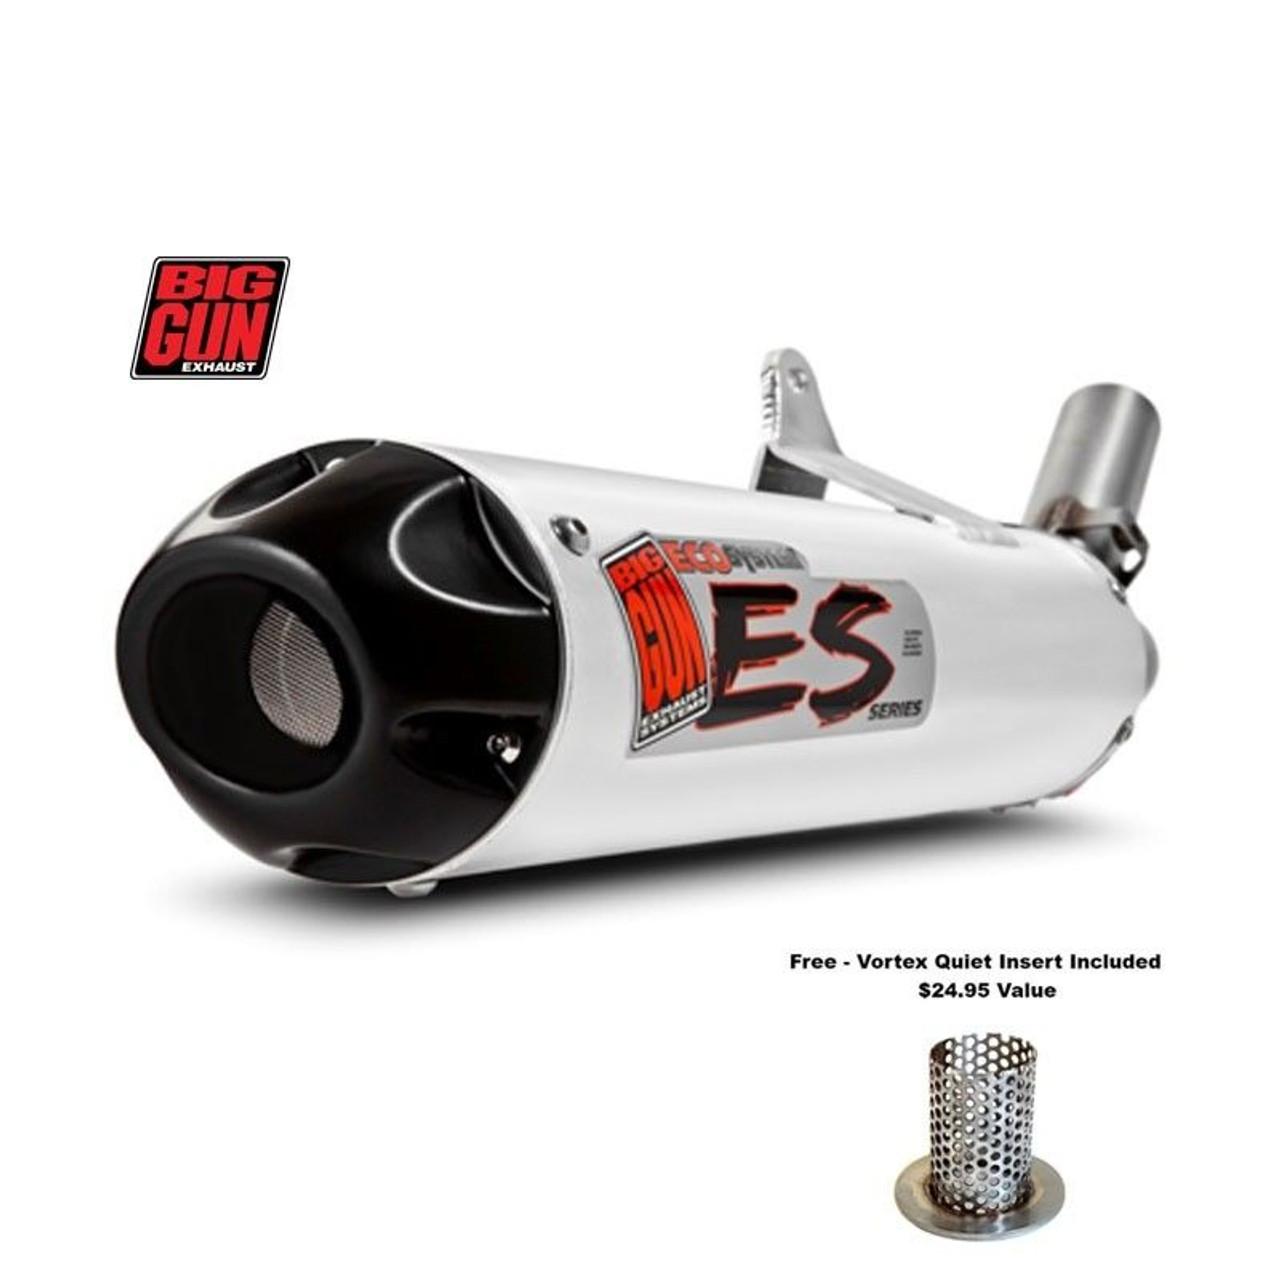 Big Gun Exhaust EVO ECO EXO Power Box EFI TFI Fuel Controller Raptor 700 2015+